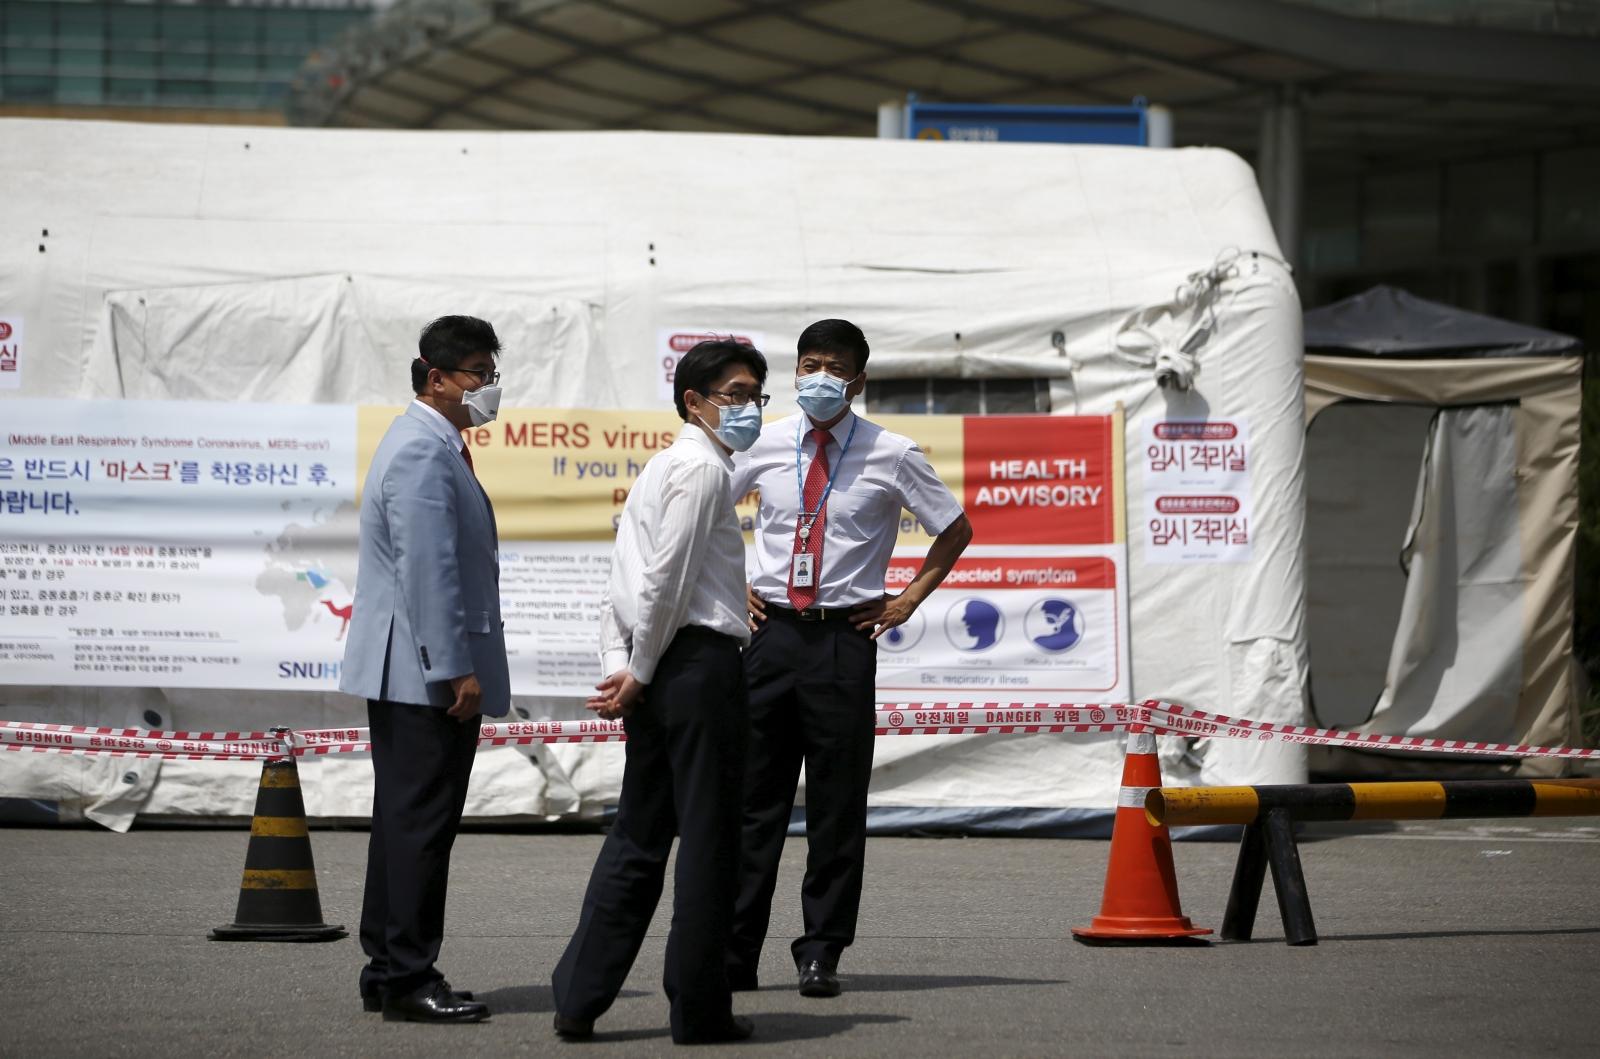 South Korea MERS outbreak